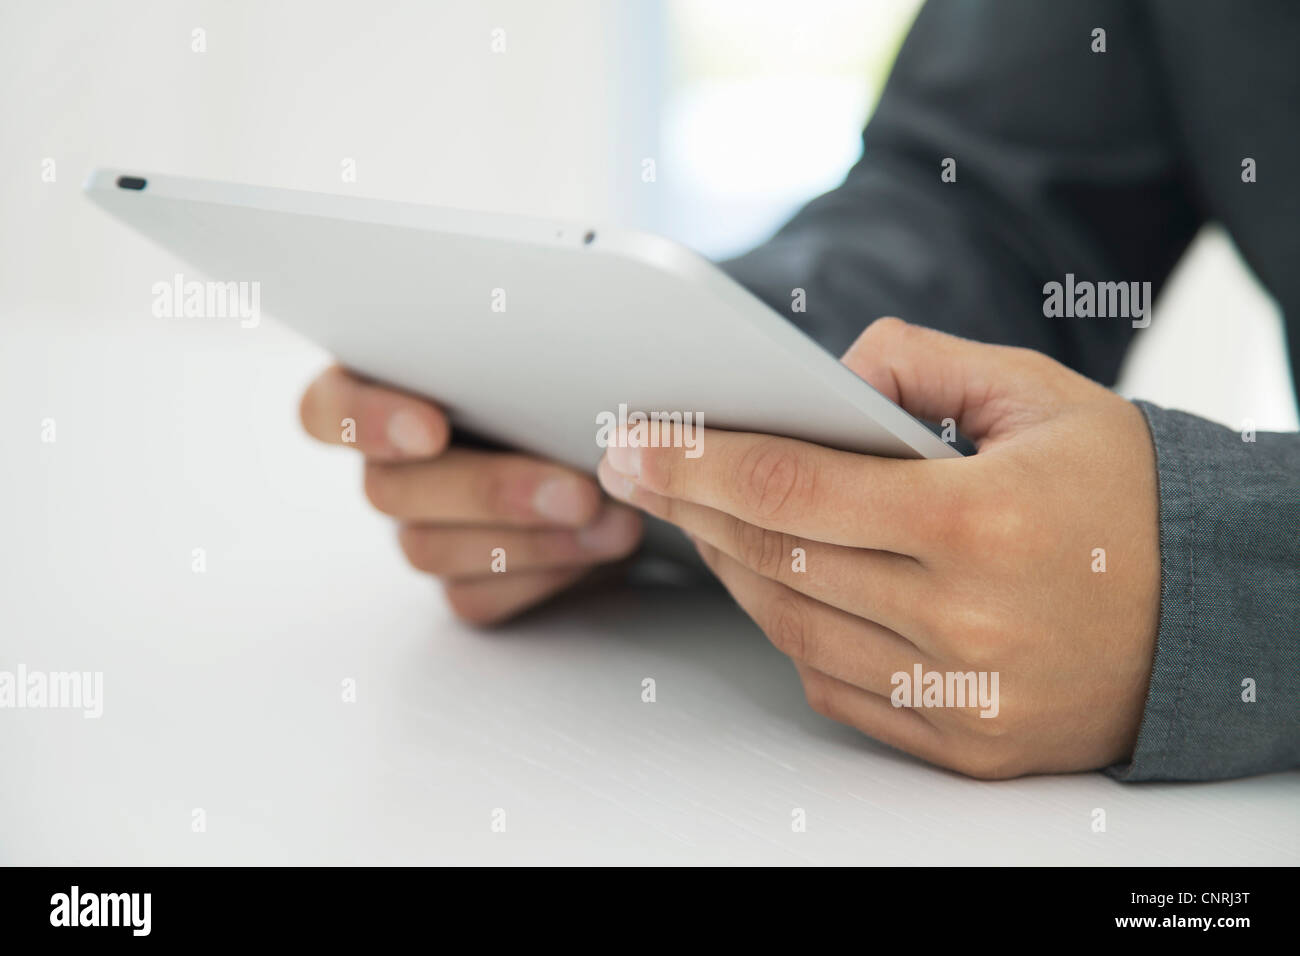 Man using digital tablet, cropped - Stock Image